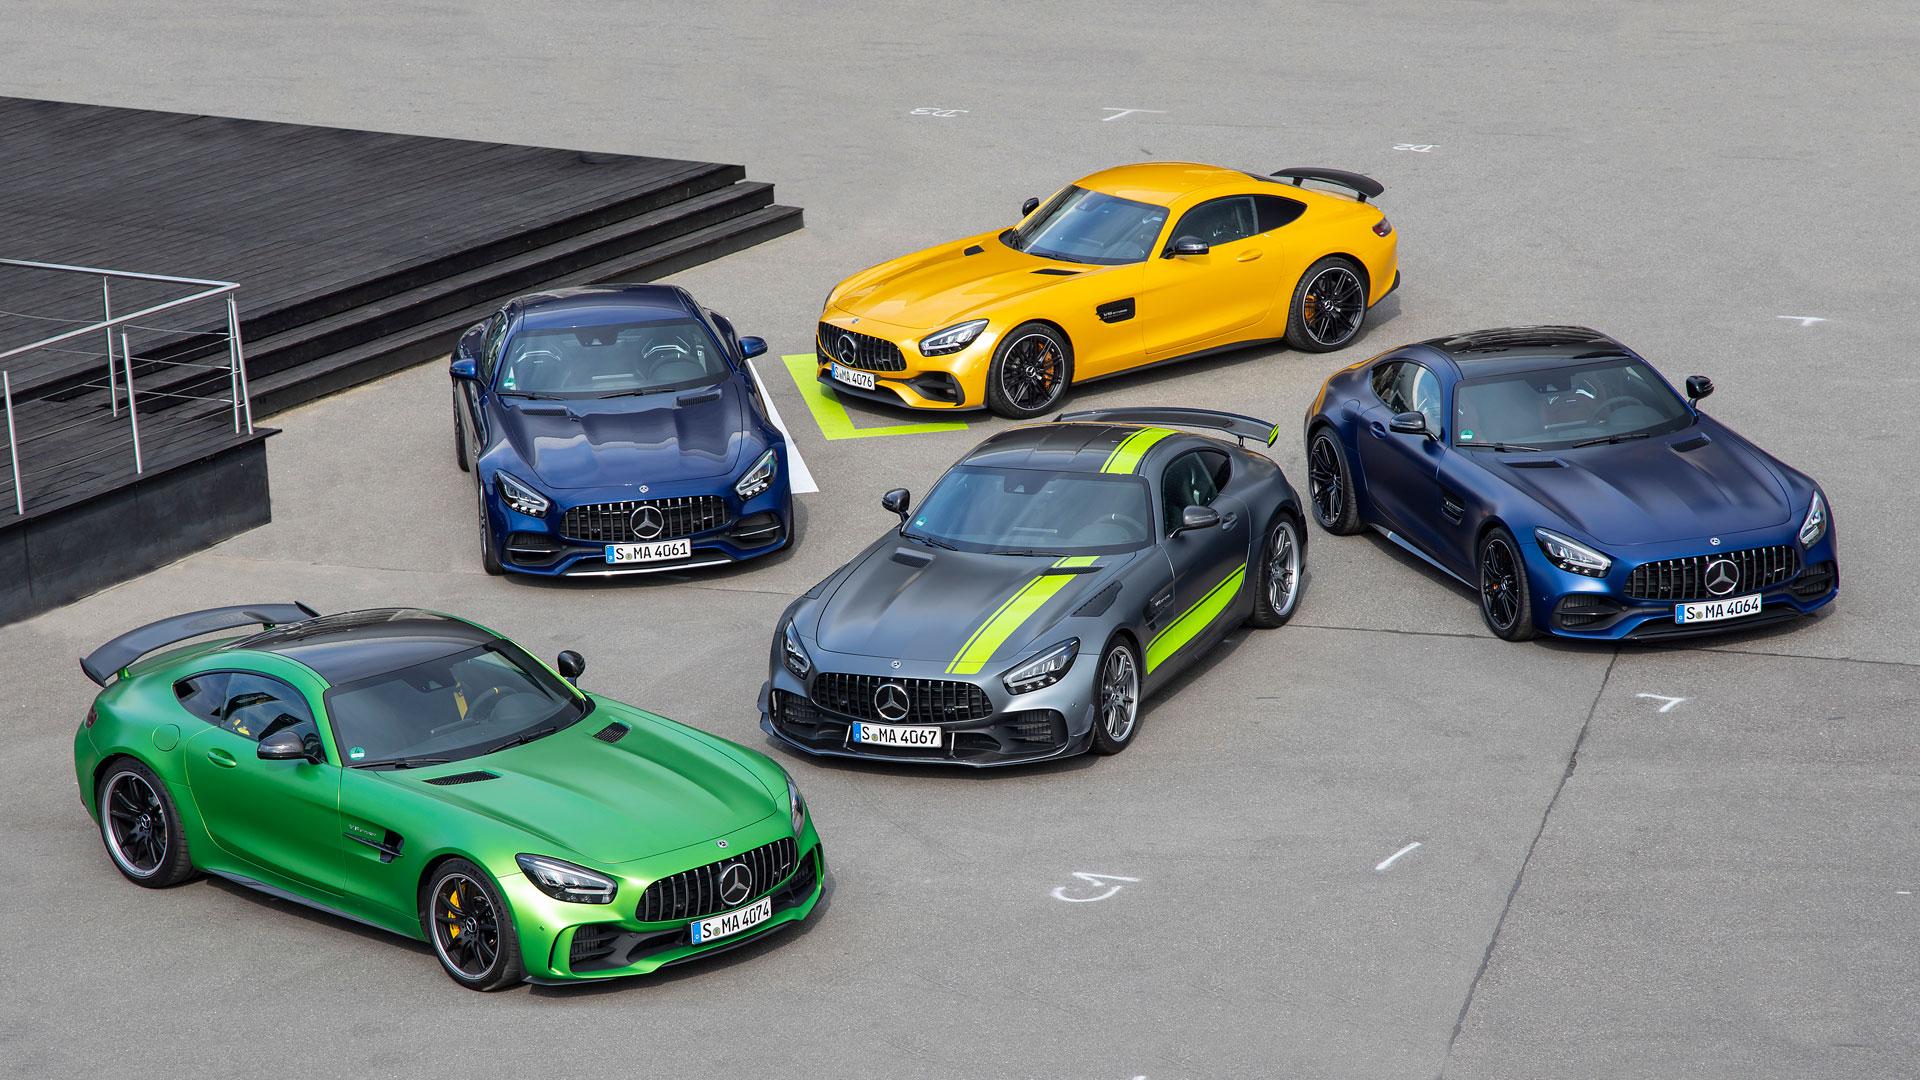 Новые Mercedes-AMG GT и AMG GT R PRO 2019: Квинтэссенция динамики и технологий